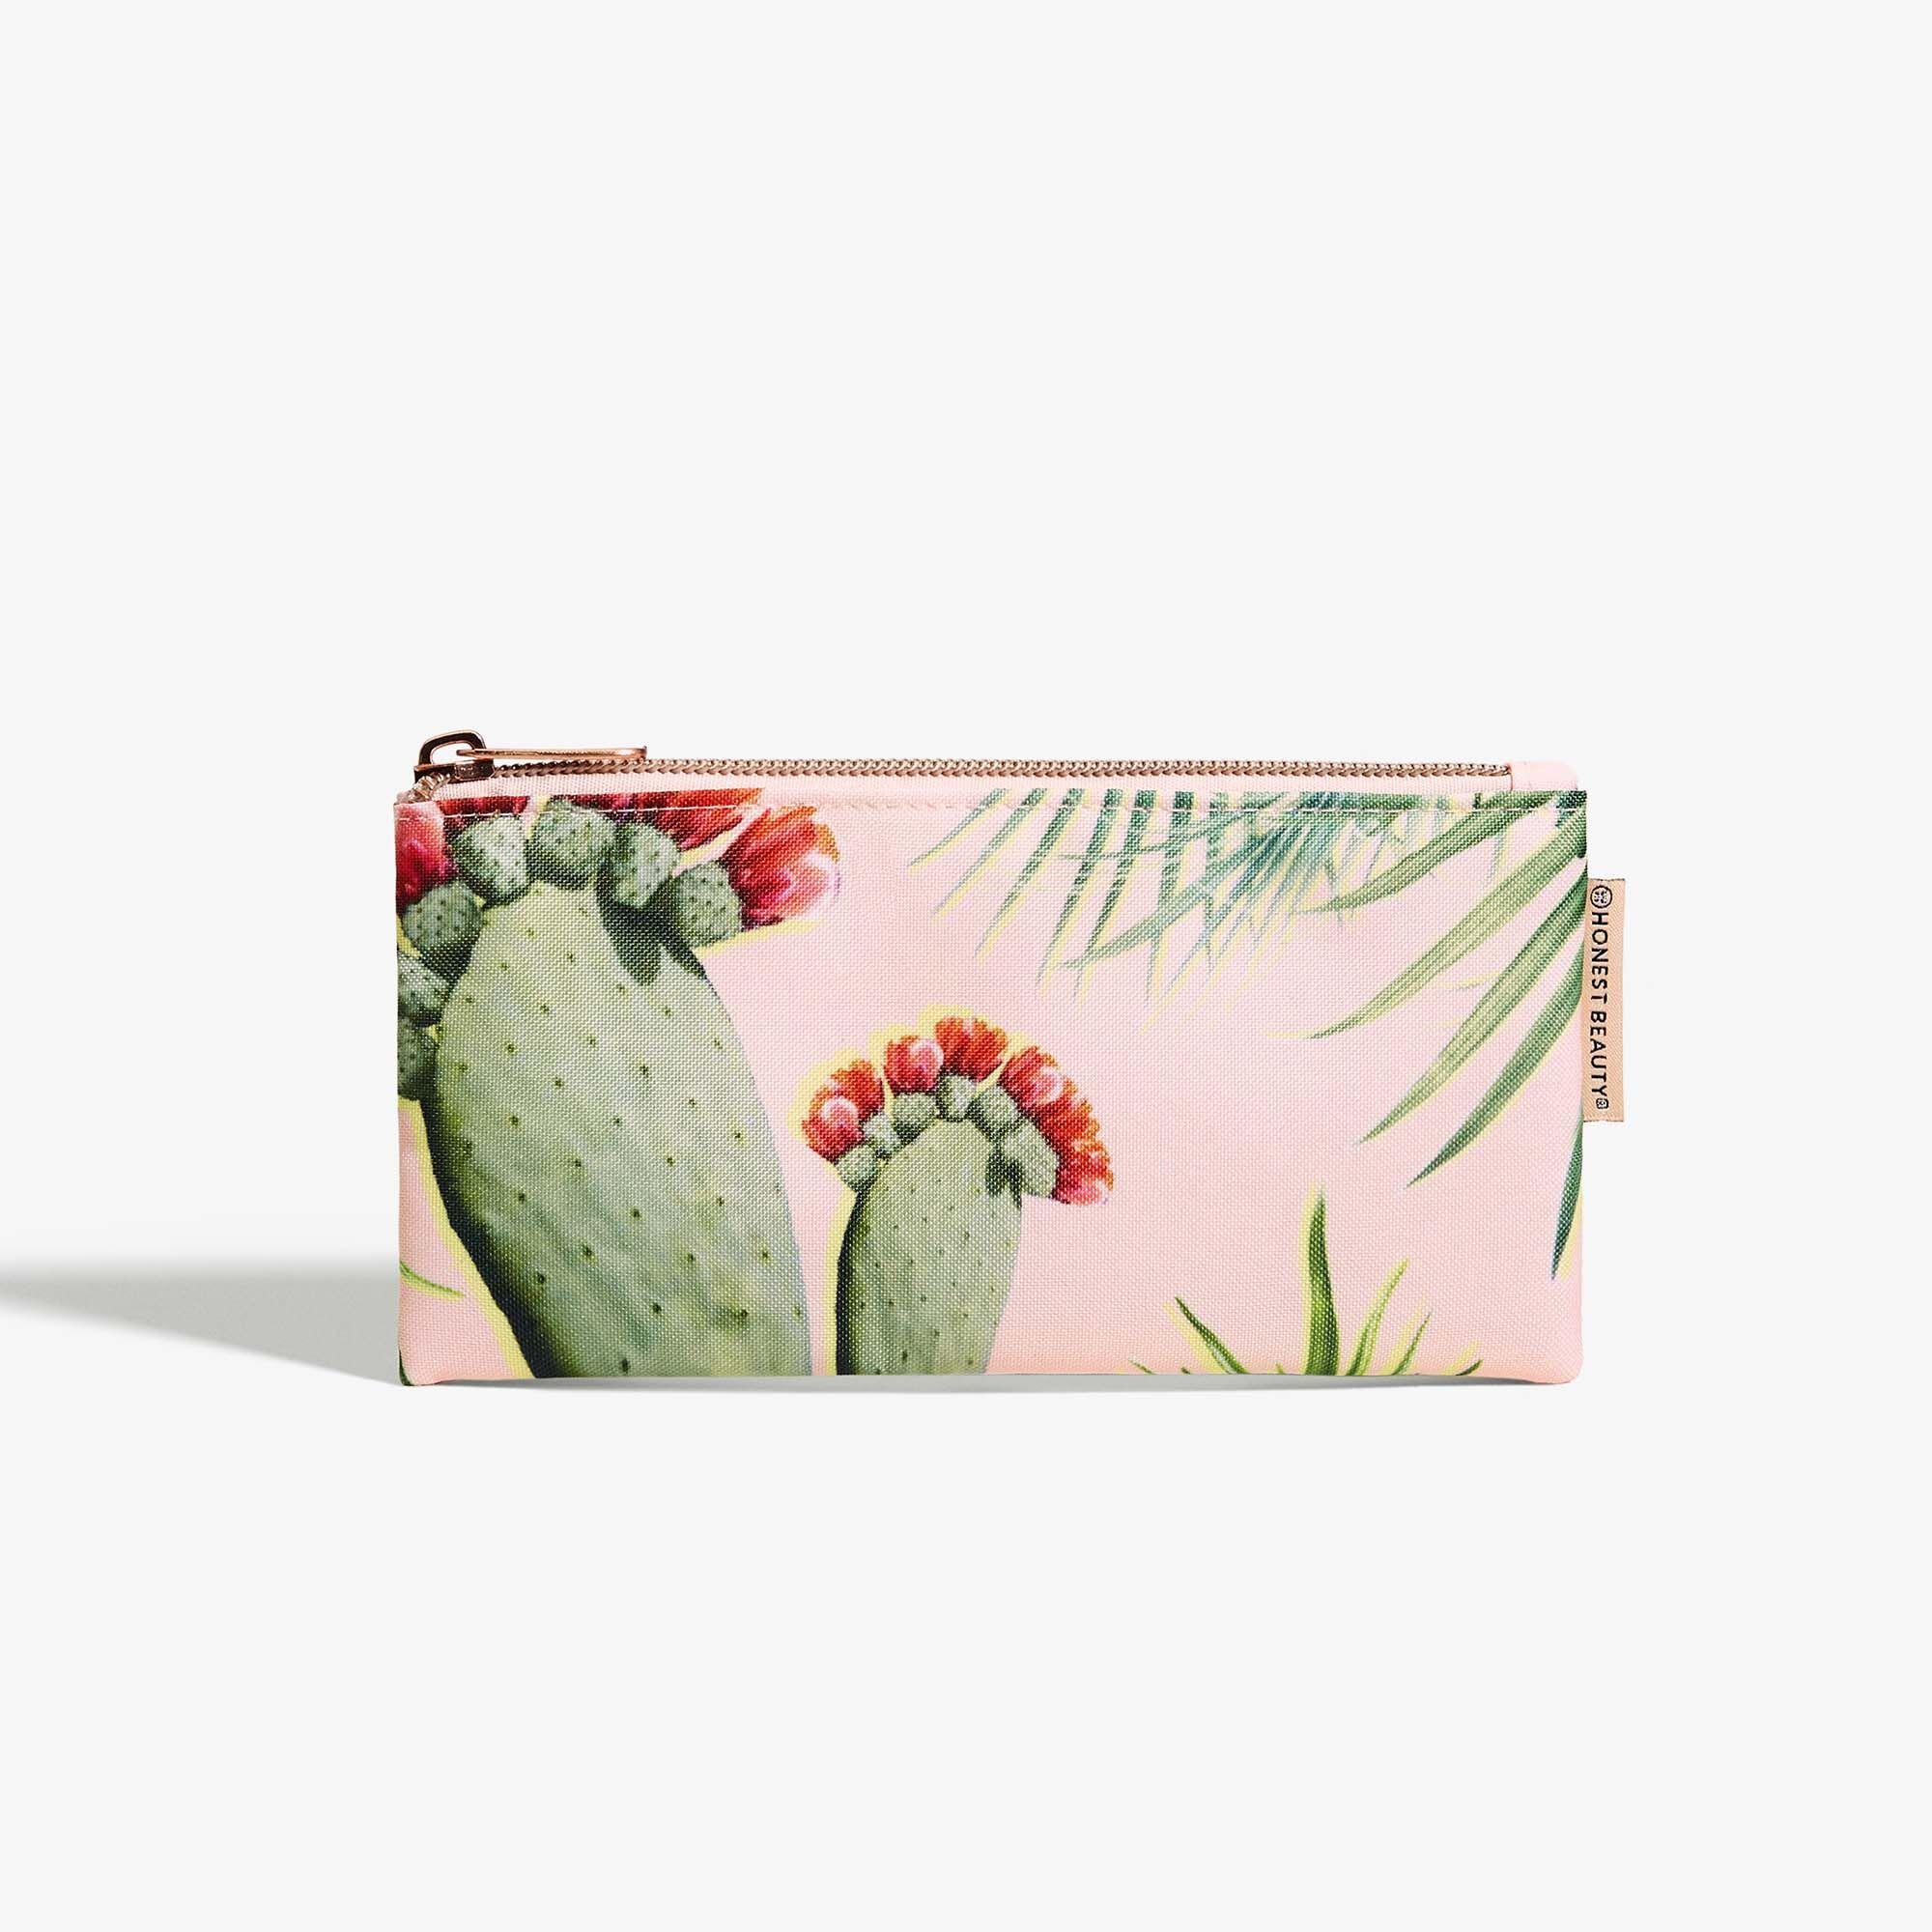 Palm Print Beauty Bag, Small